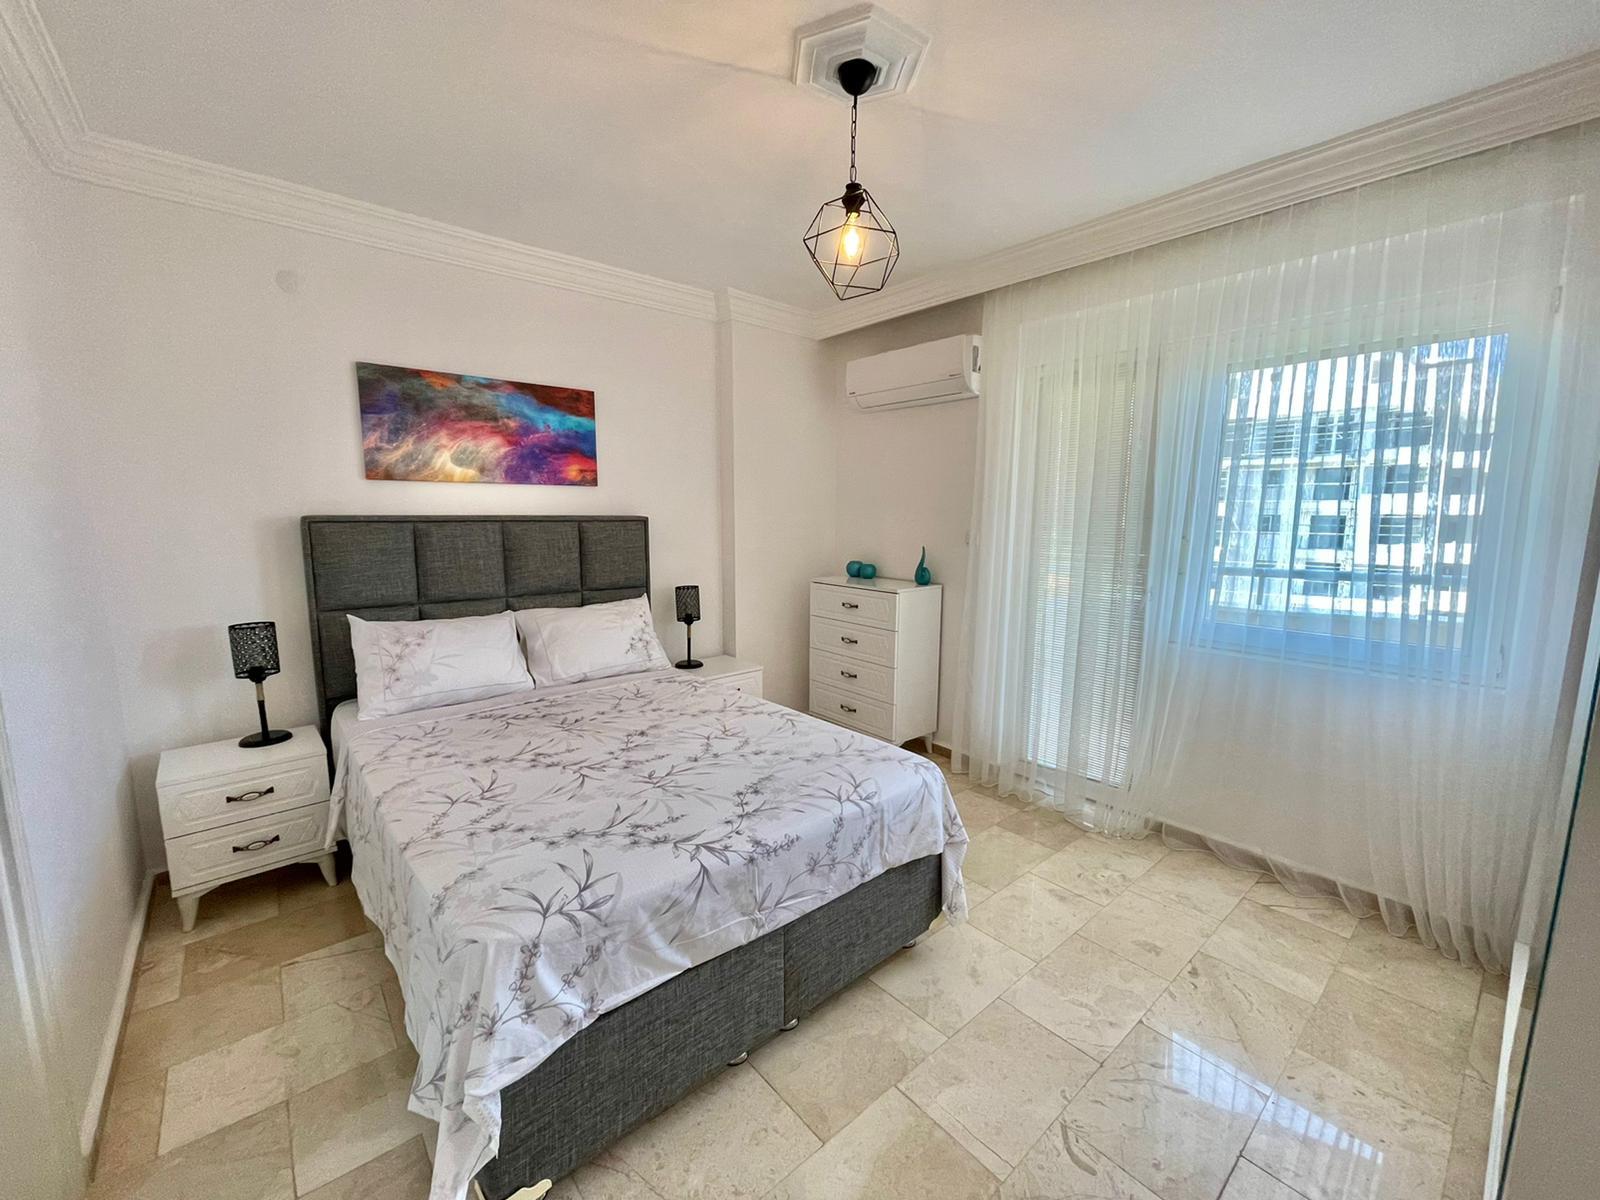 Трёхкомнатная квартира в «двух шагах» от Средиземного моря - Фото 16